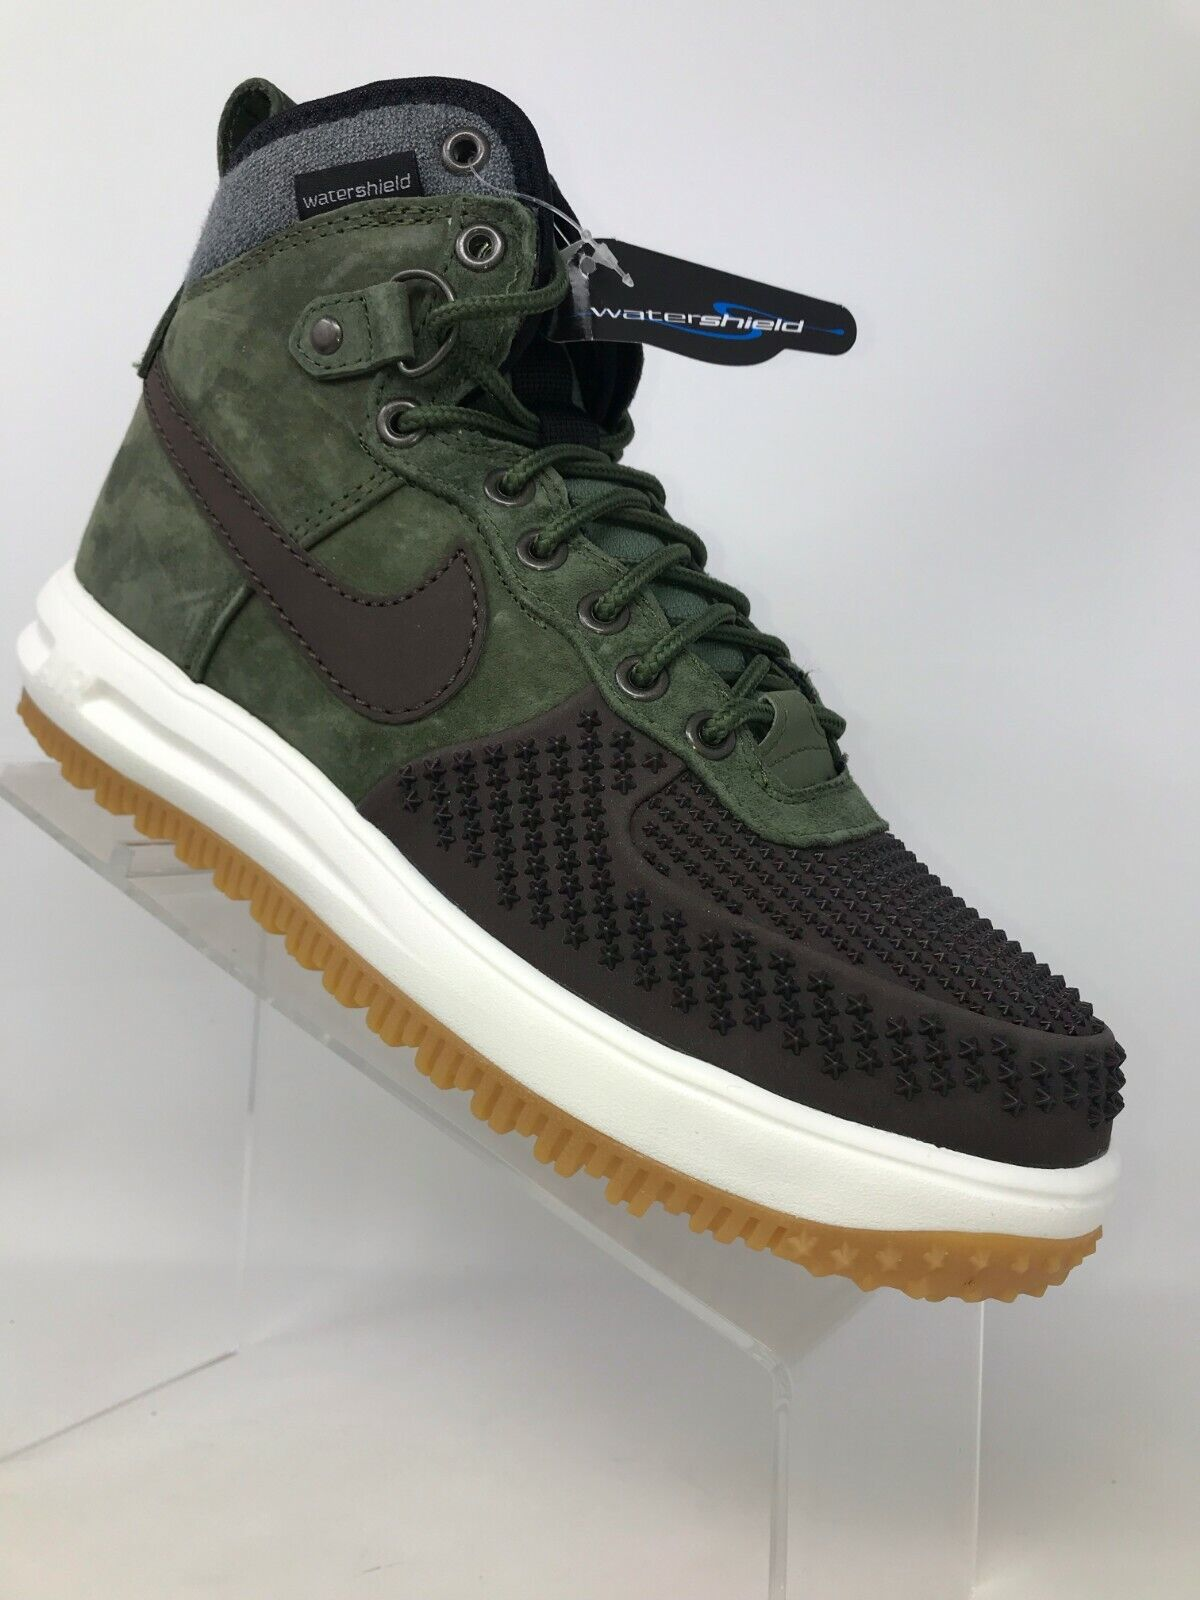 Nike Lunar Force 1 Duckboot Baroque Brown Army Olive Black 805899 200 Men 7